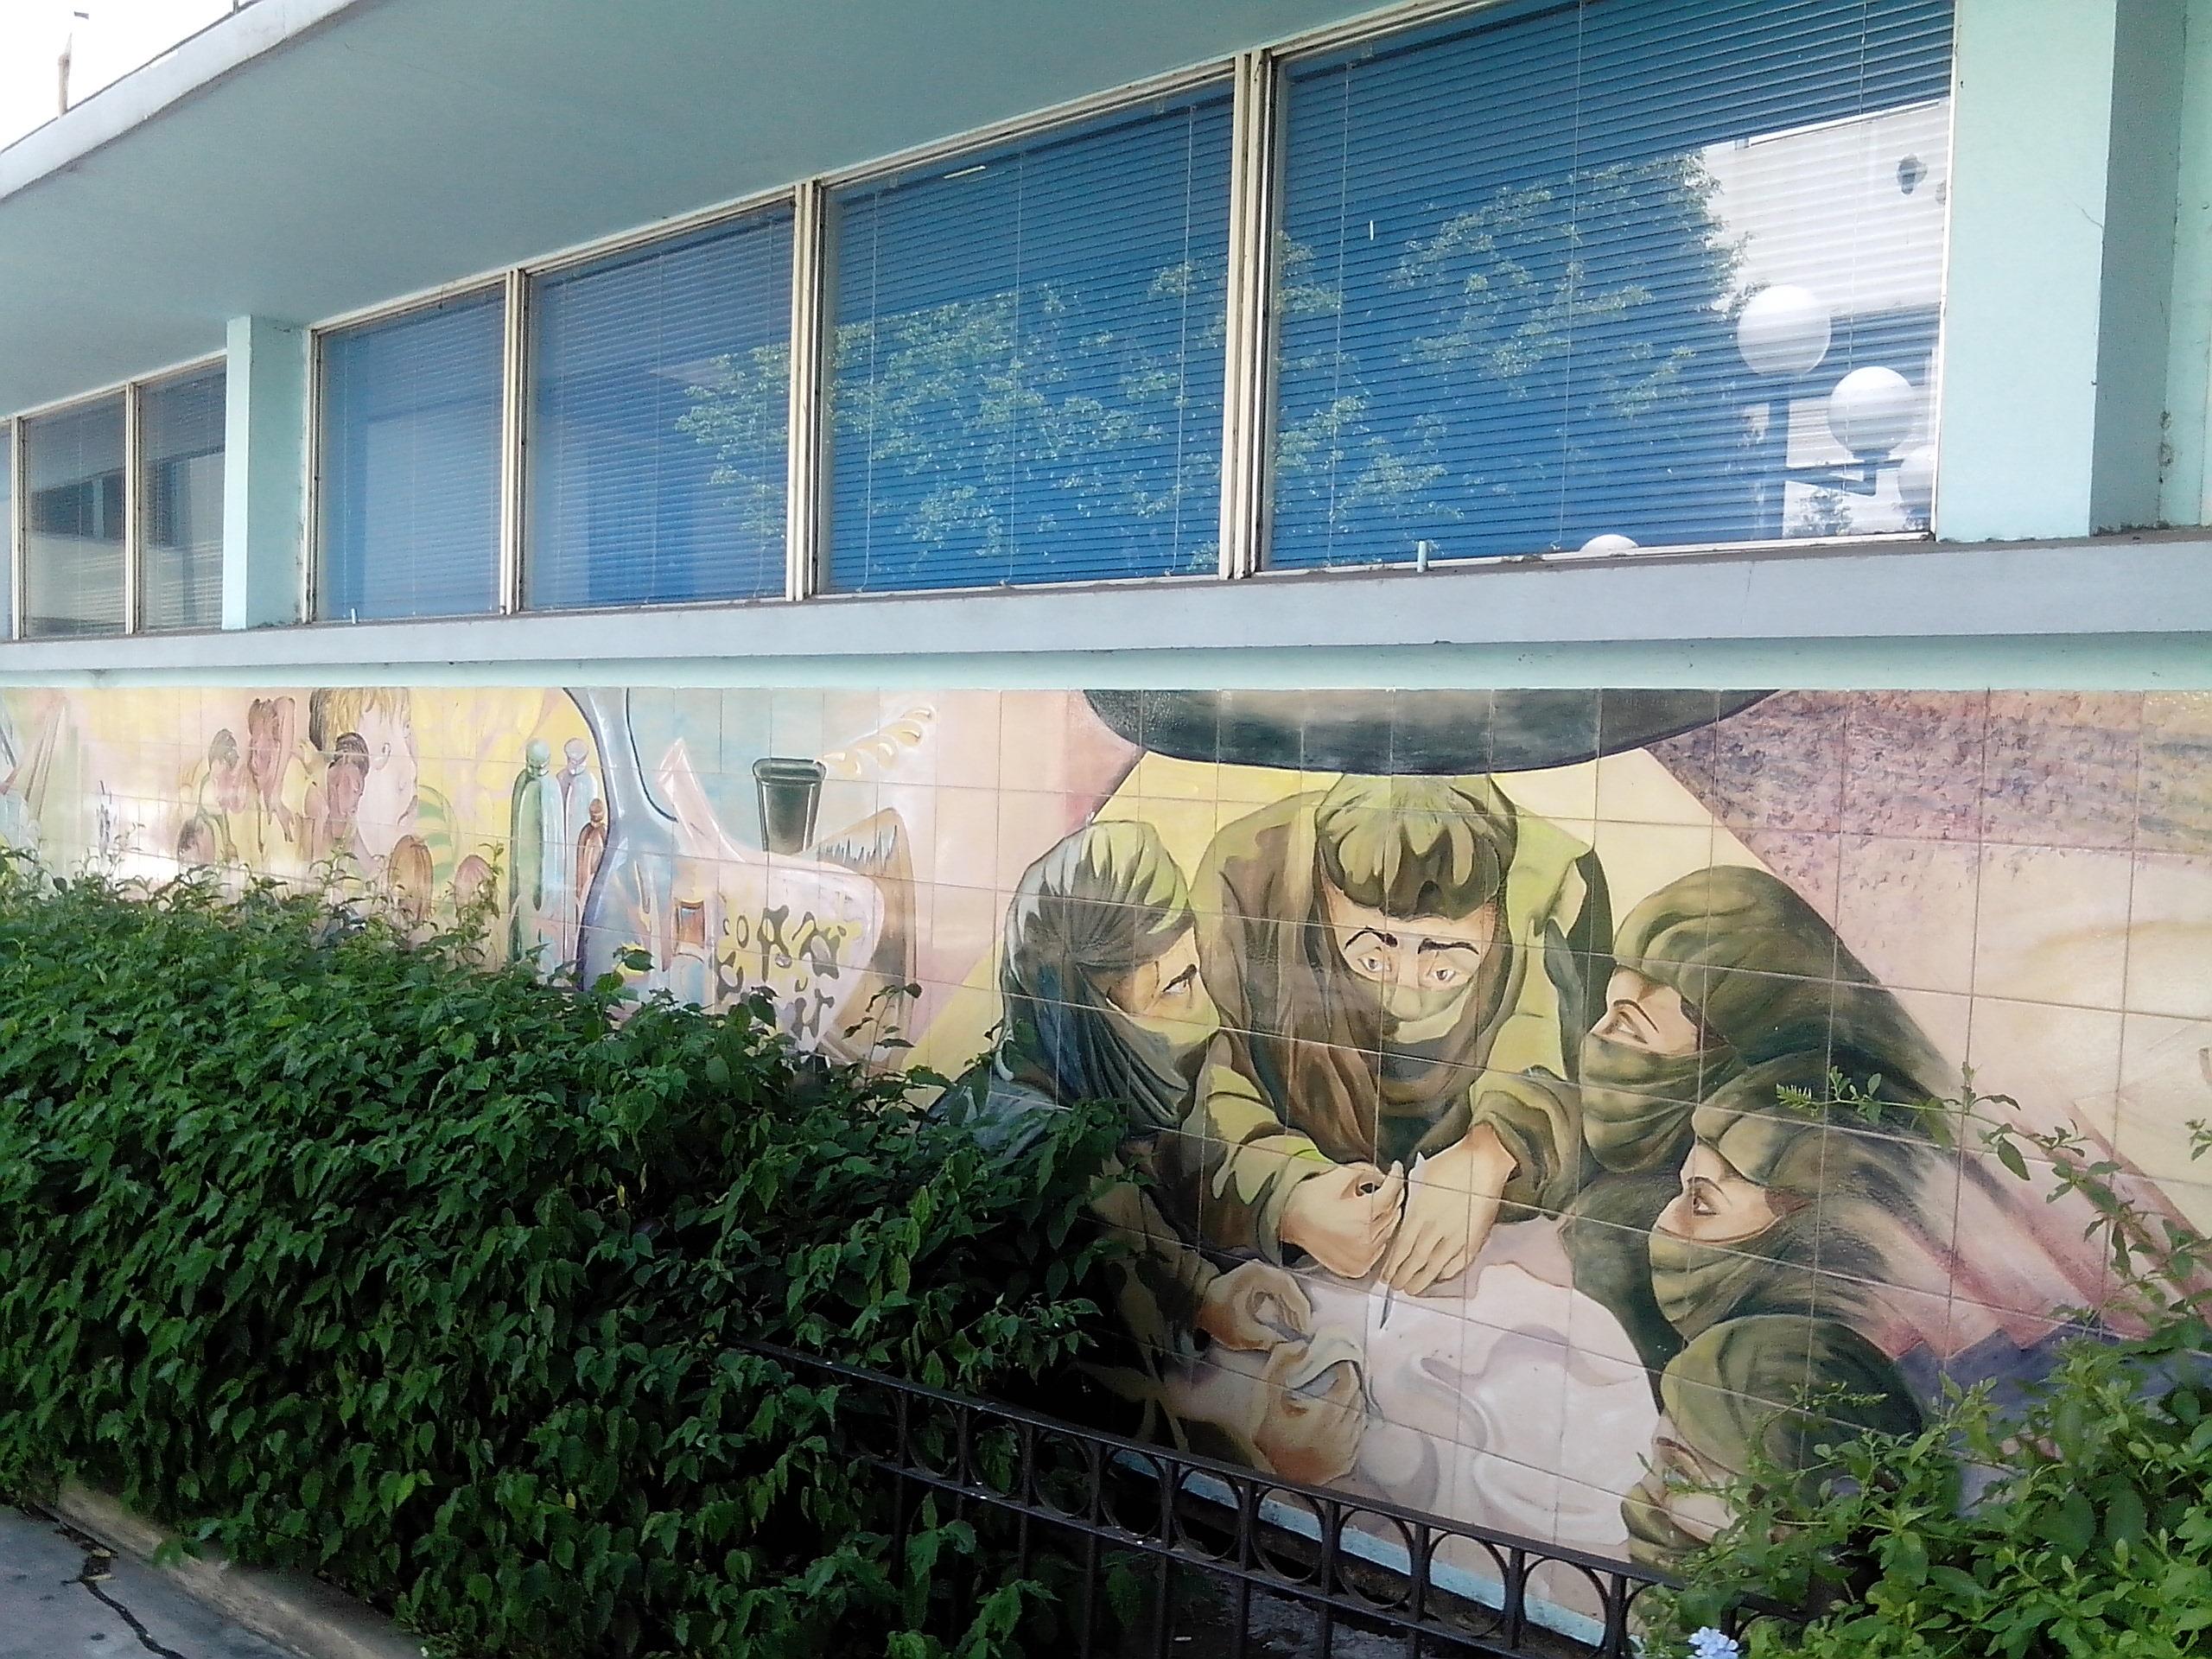 Mural dentro del Hospital Fiorito - Mural en el Hospital Fiorito